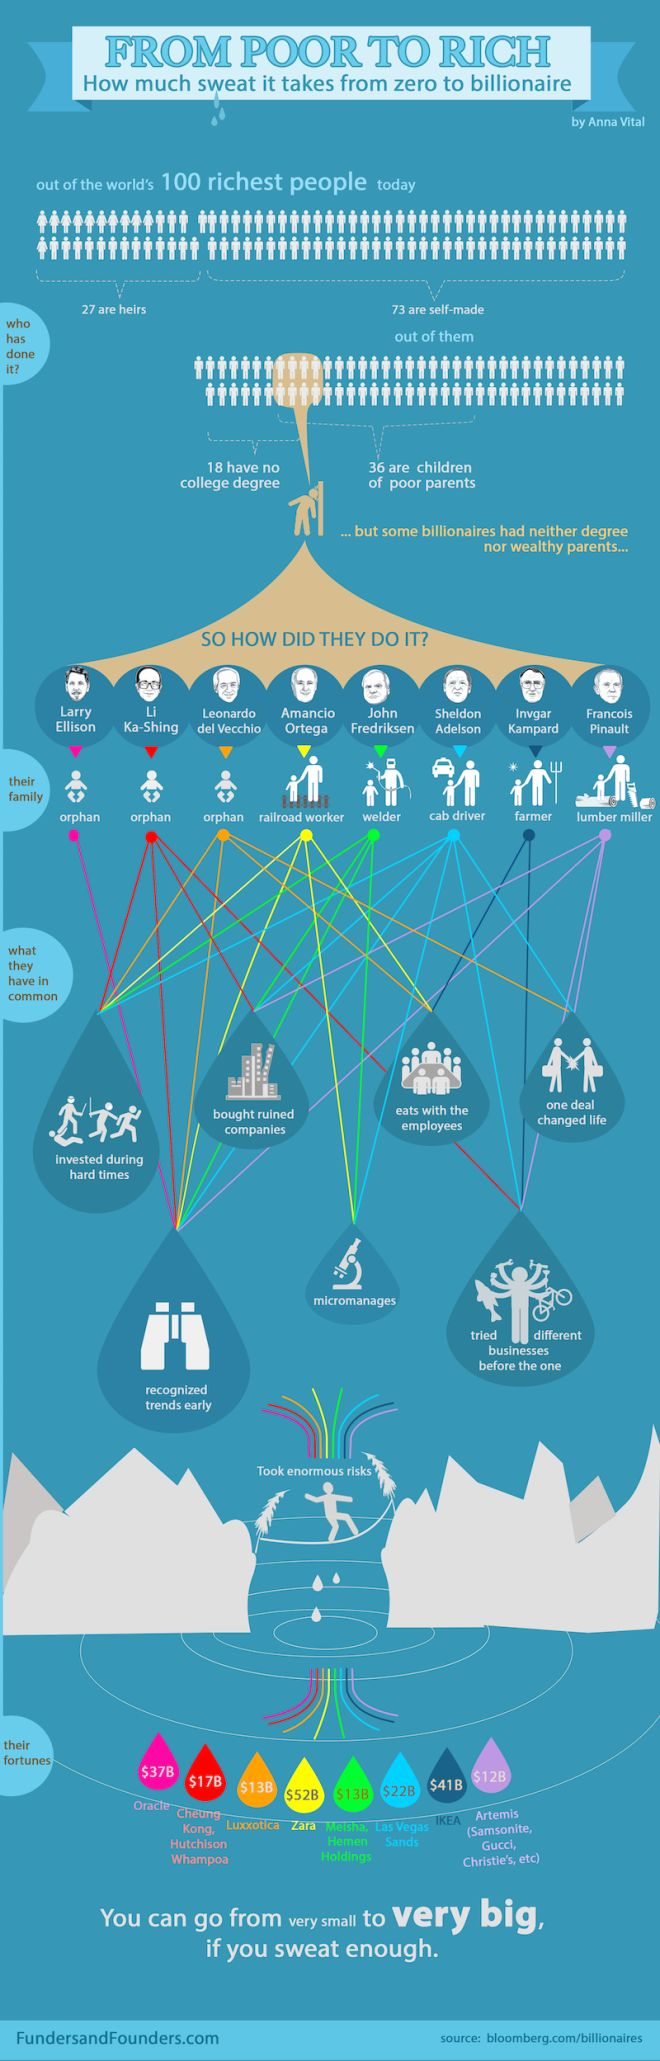 from zero to billionaire - self-made billionaire infographic